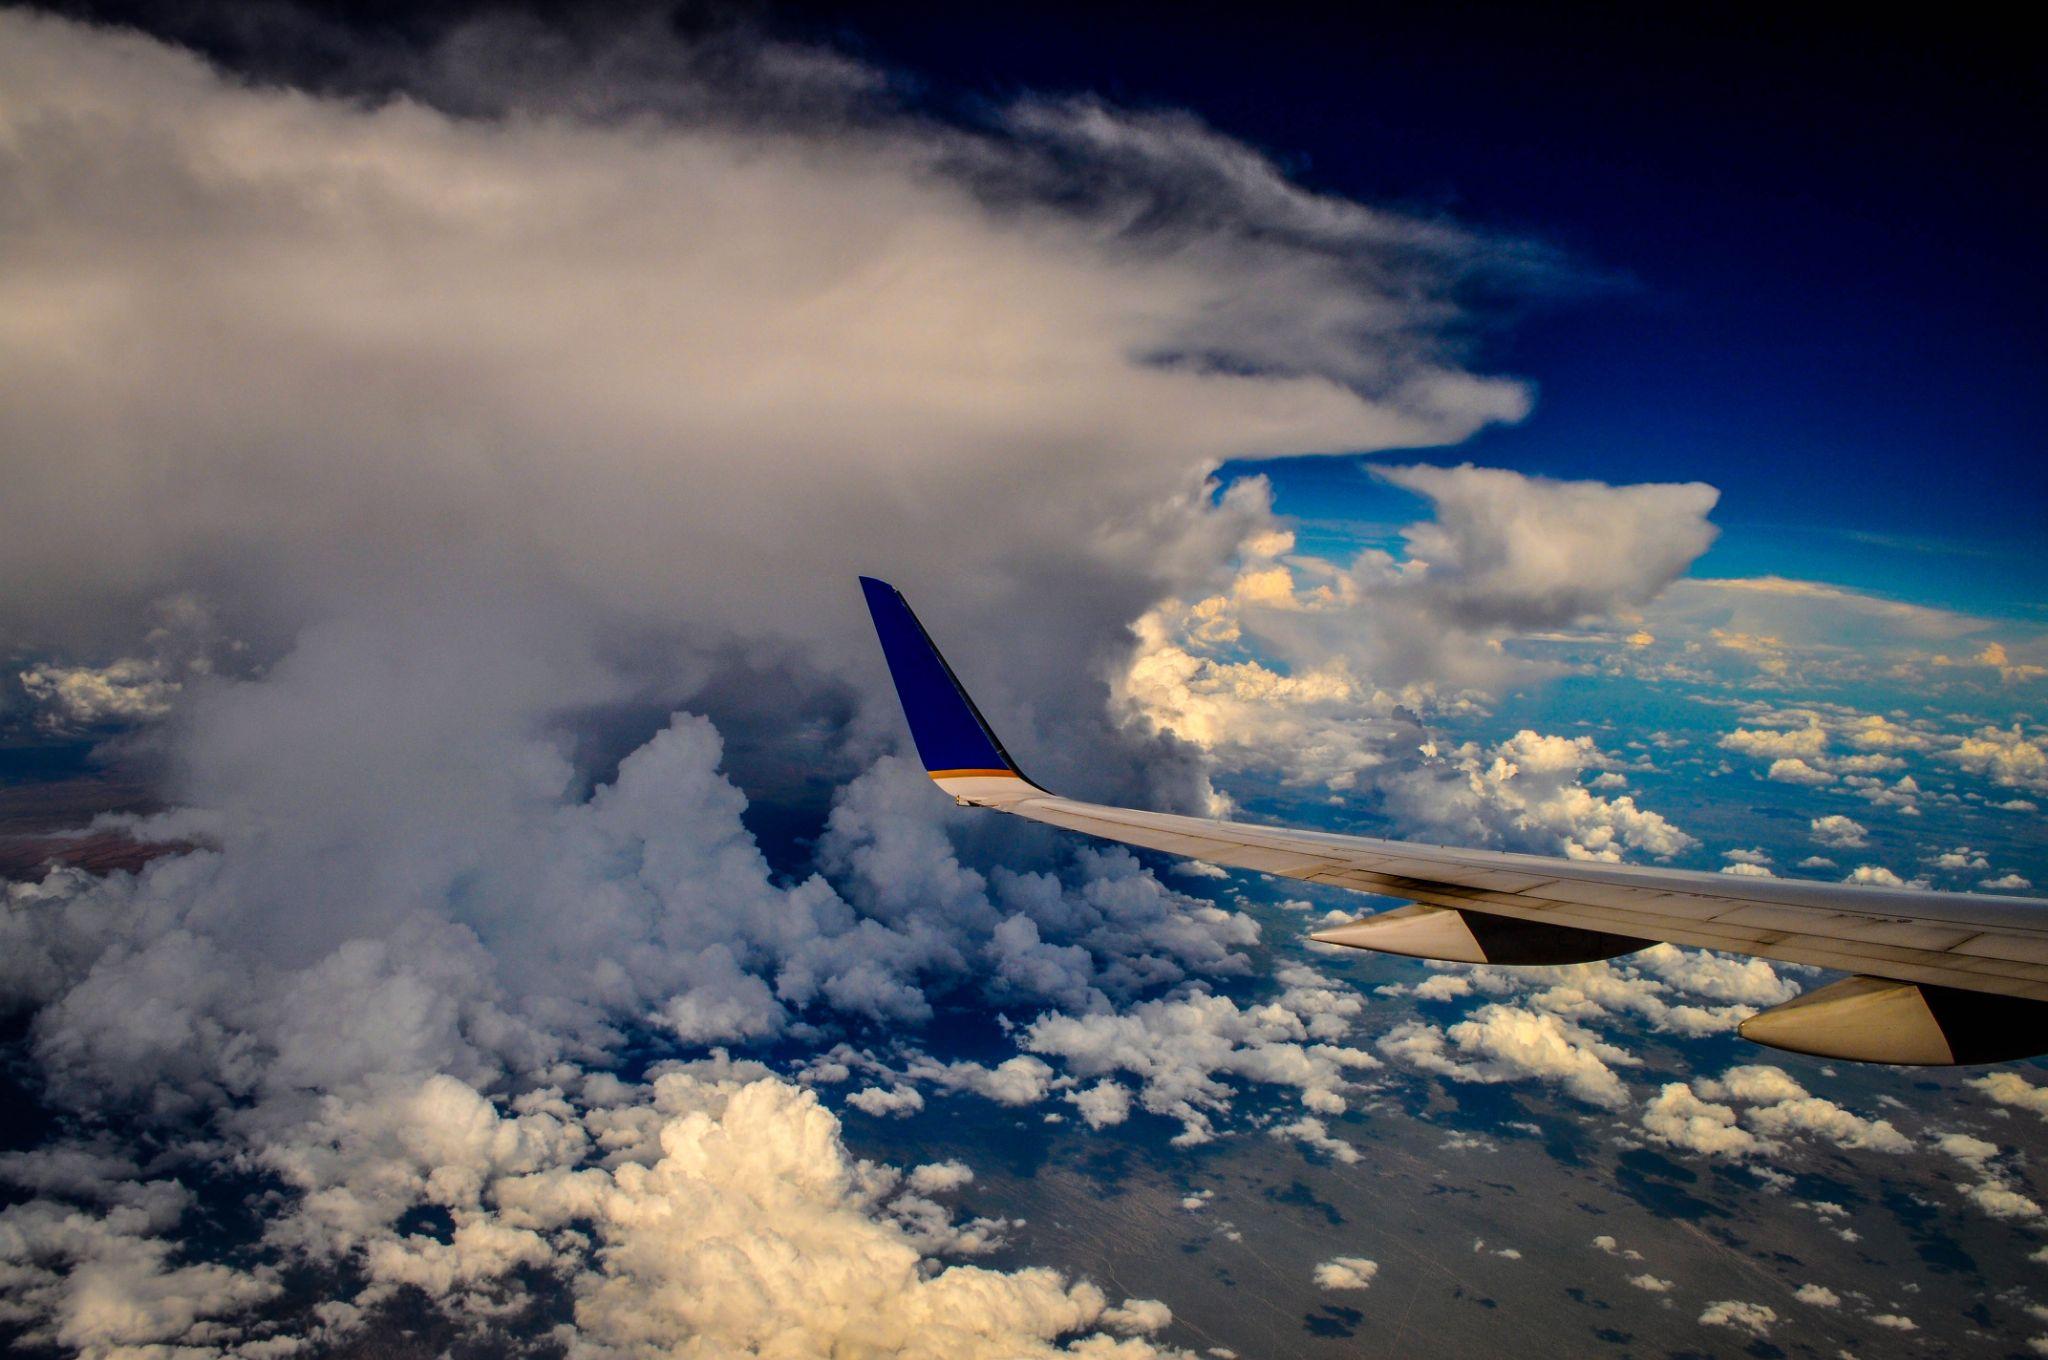 Around a storm by Thomas Hubener